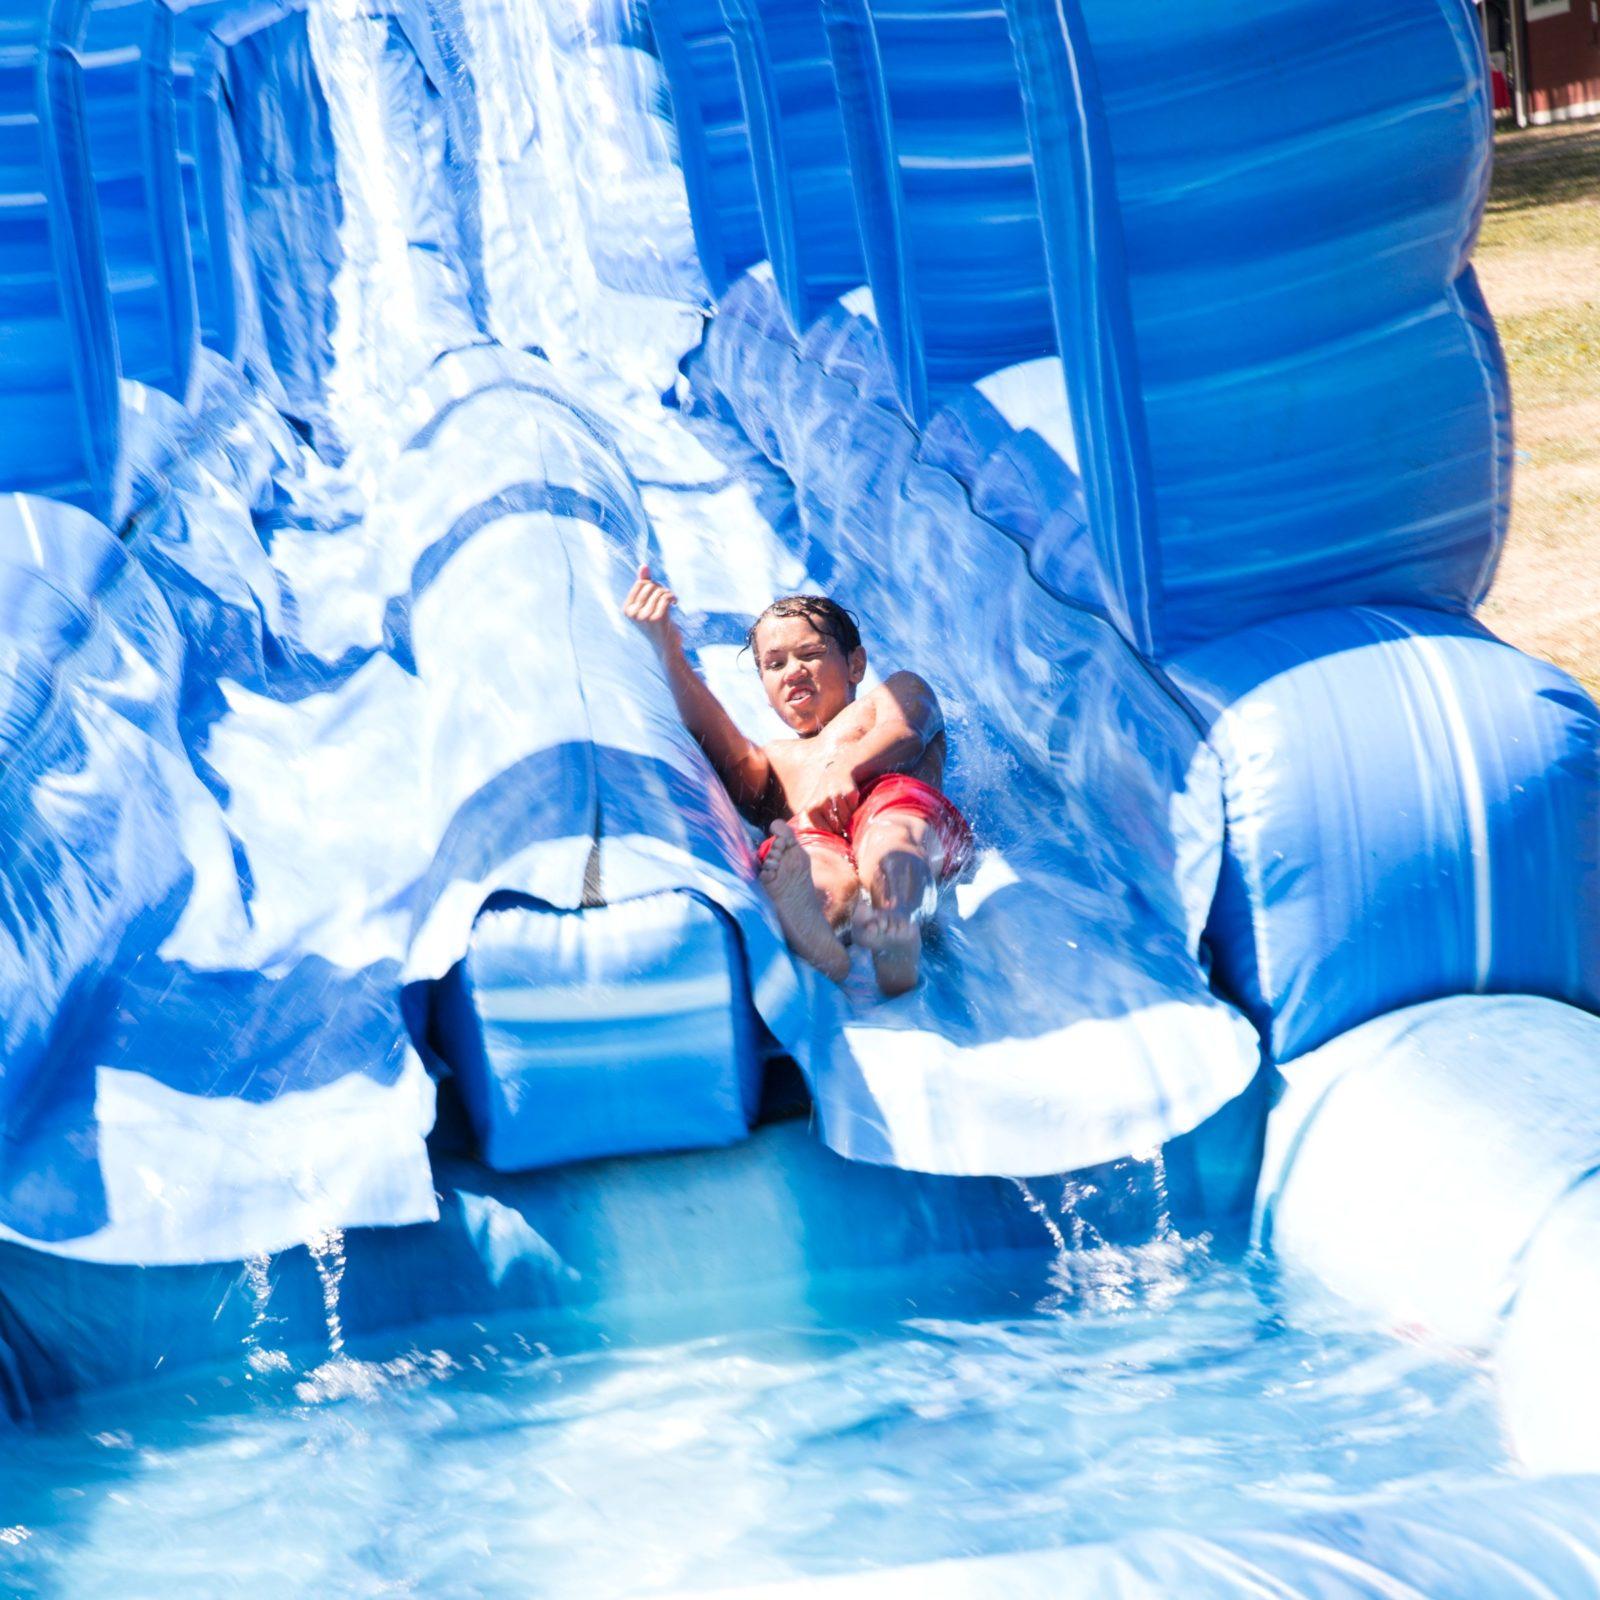 Raging Rapids Xtreme Inflatable Water Slide: 100-ft Long Blue Crush Water Slide Rental